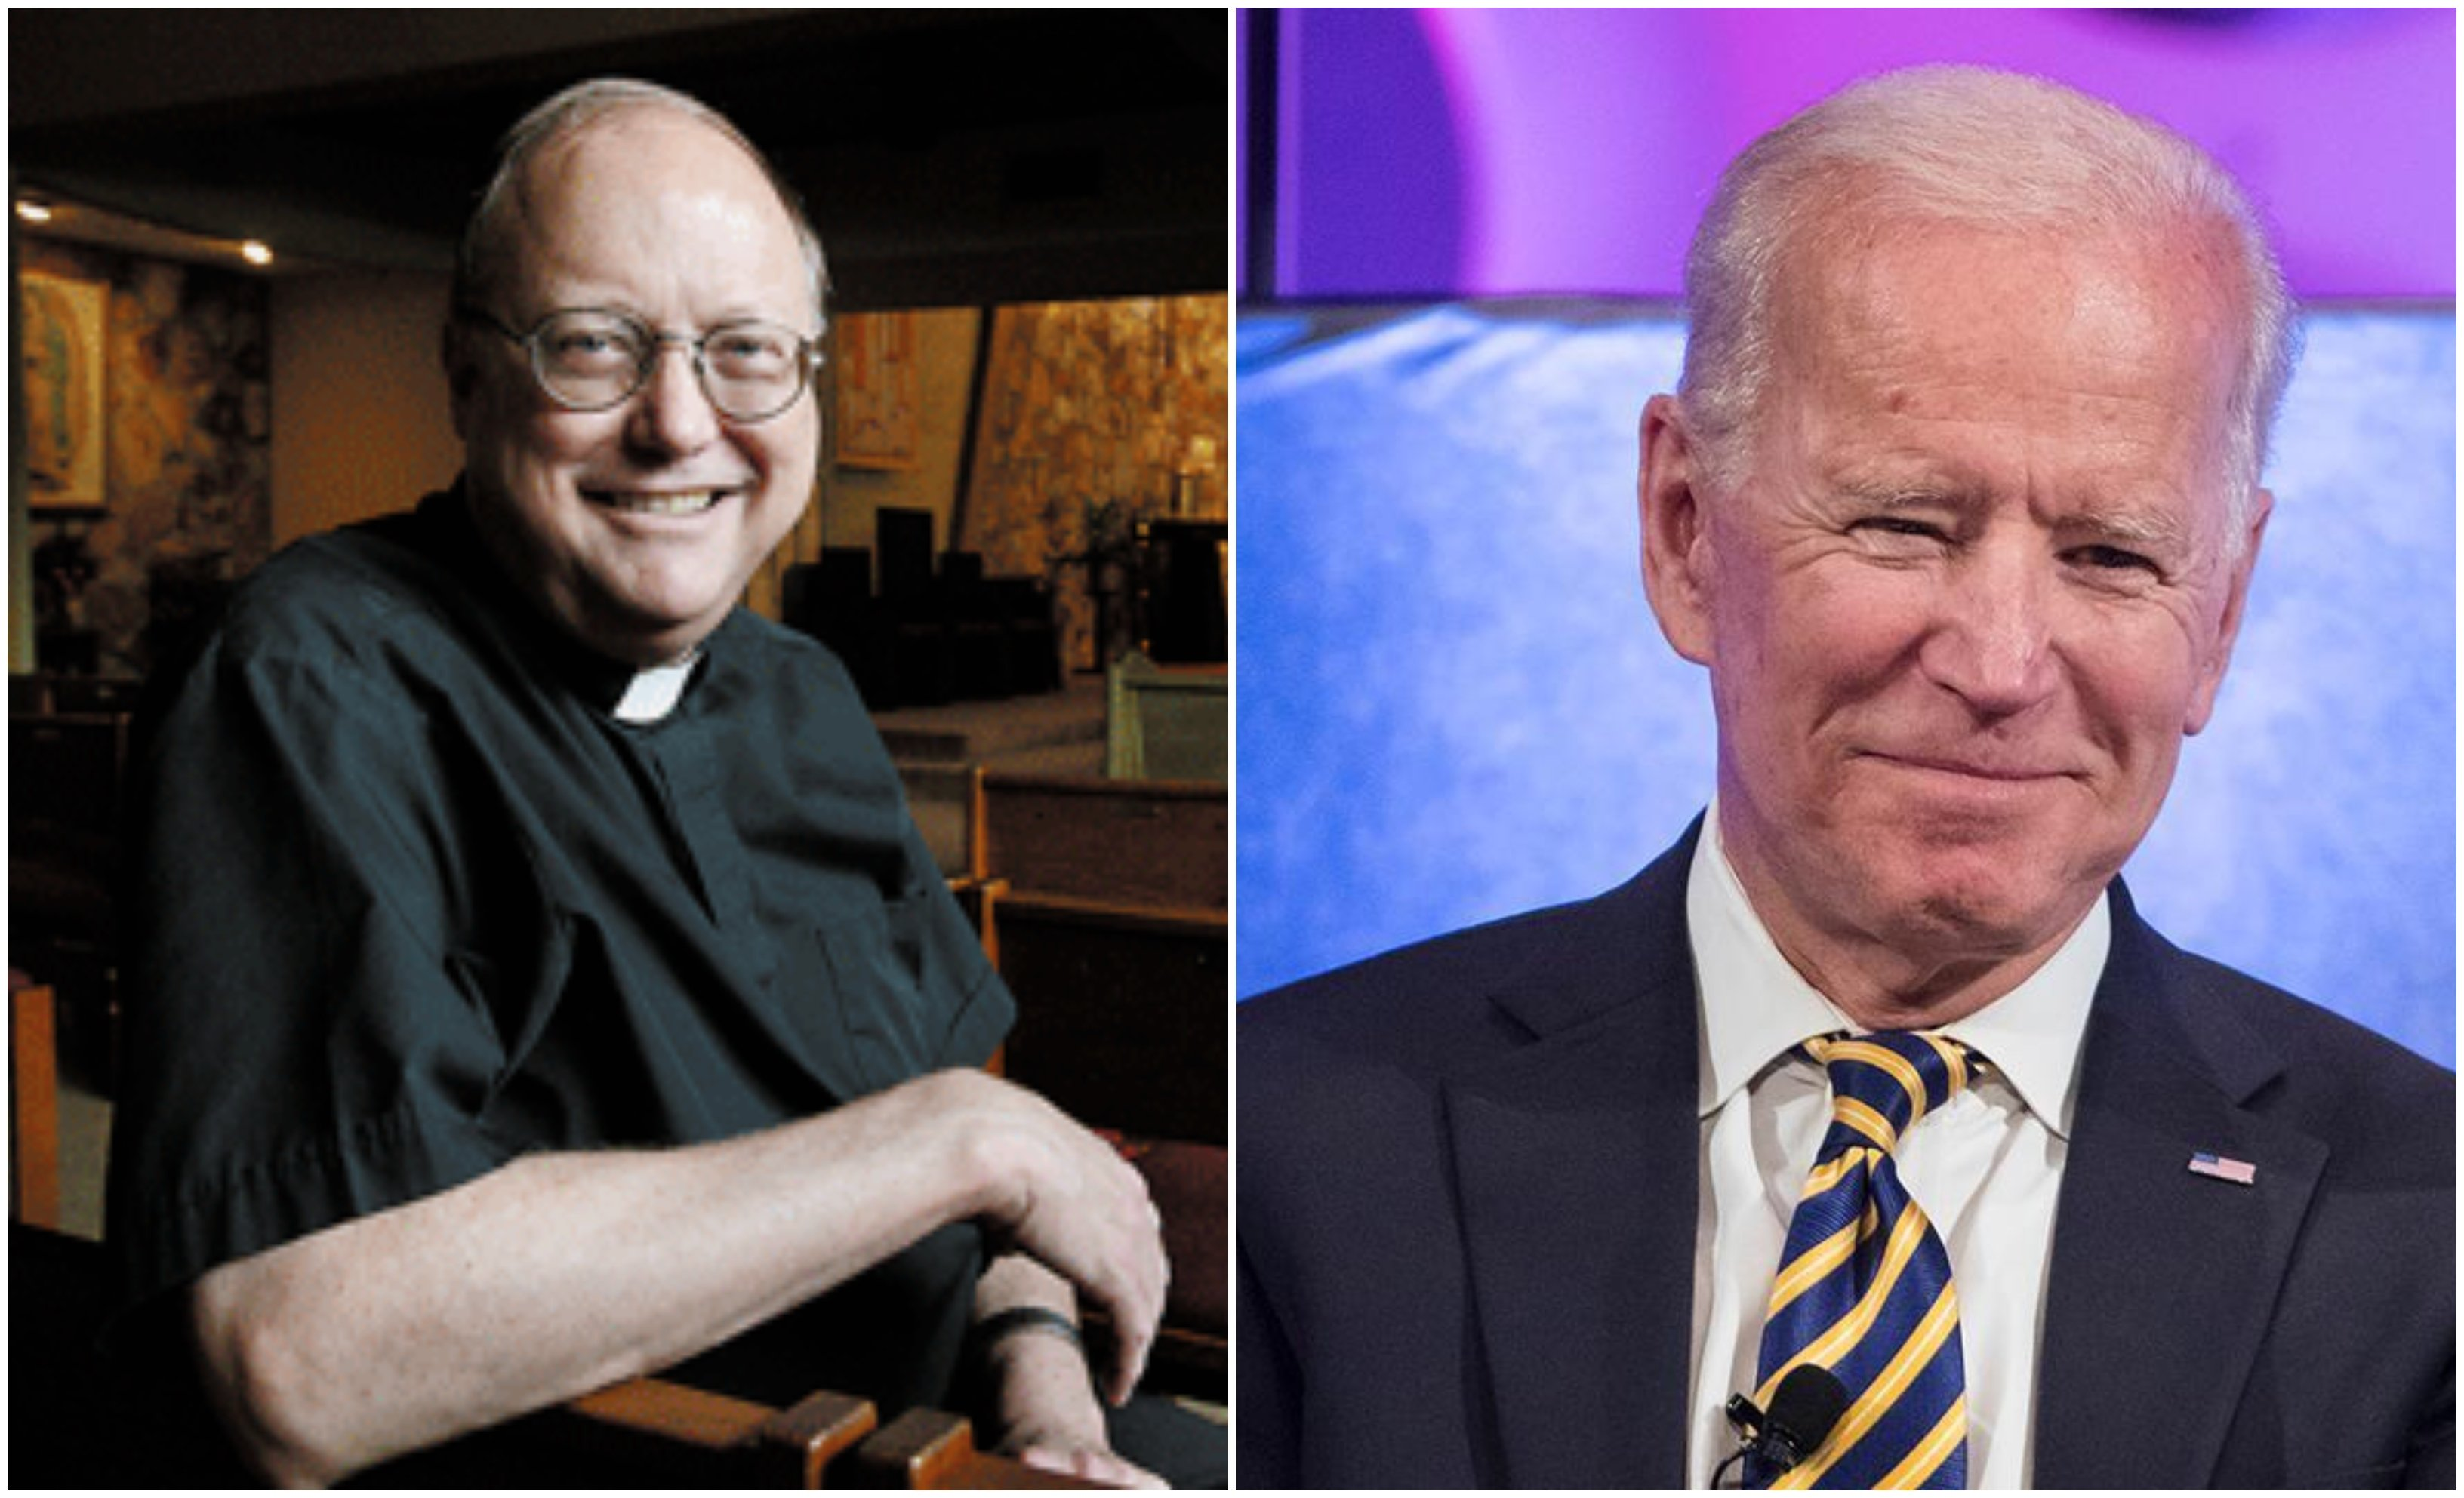 El P. Robert Morey niega la Eucaristía a Joe Biden